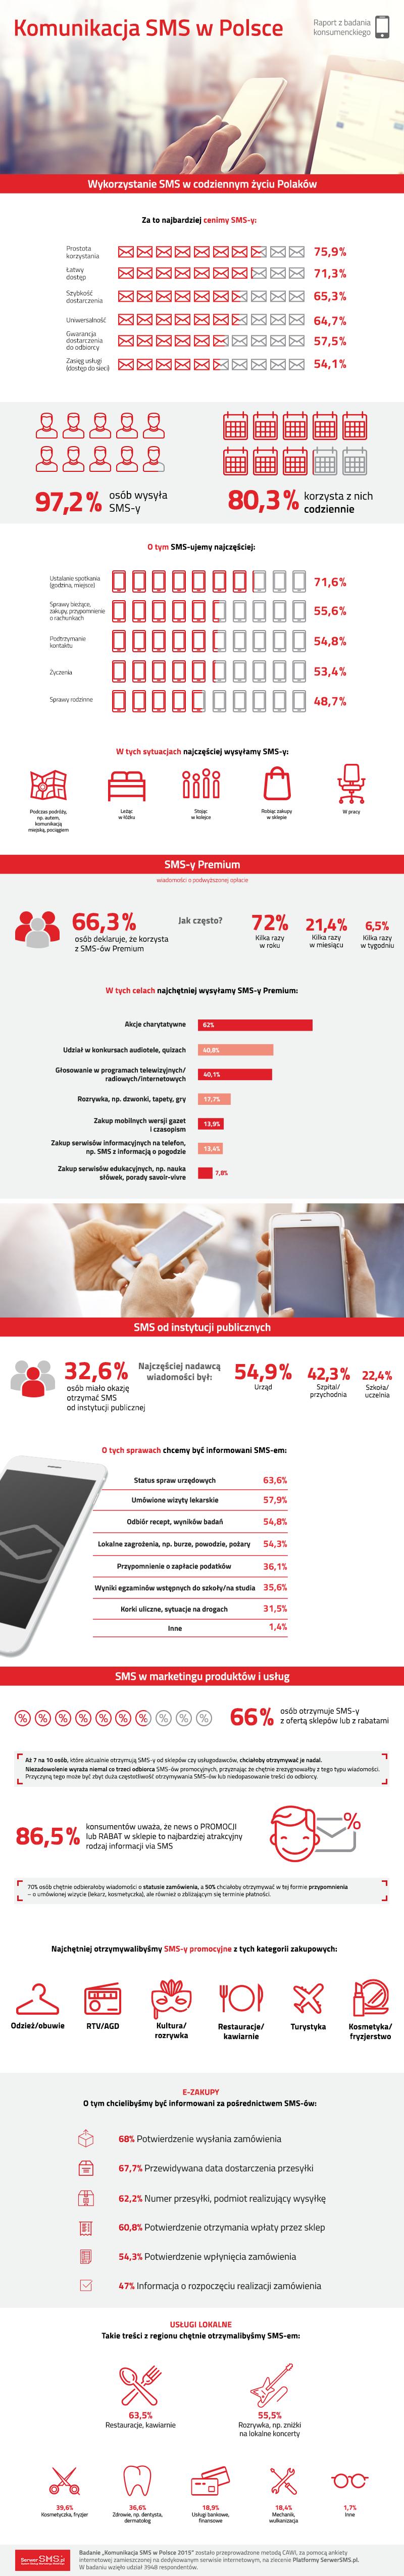 SMS raport